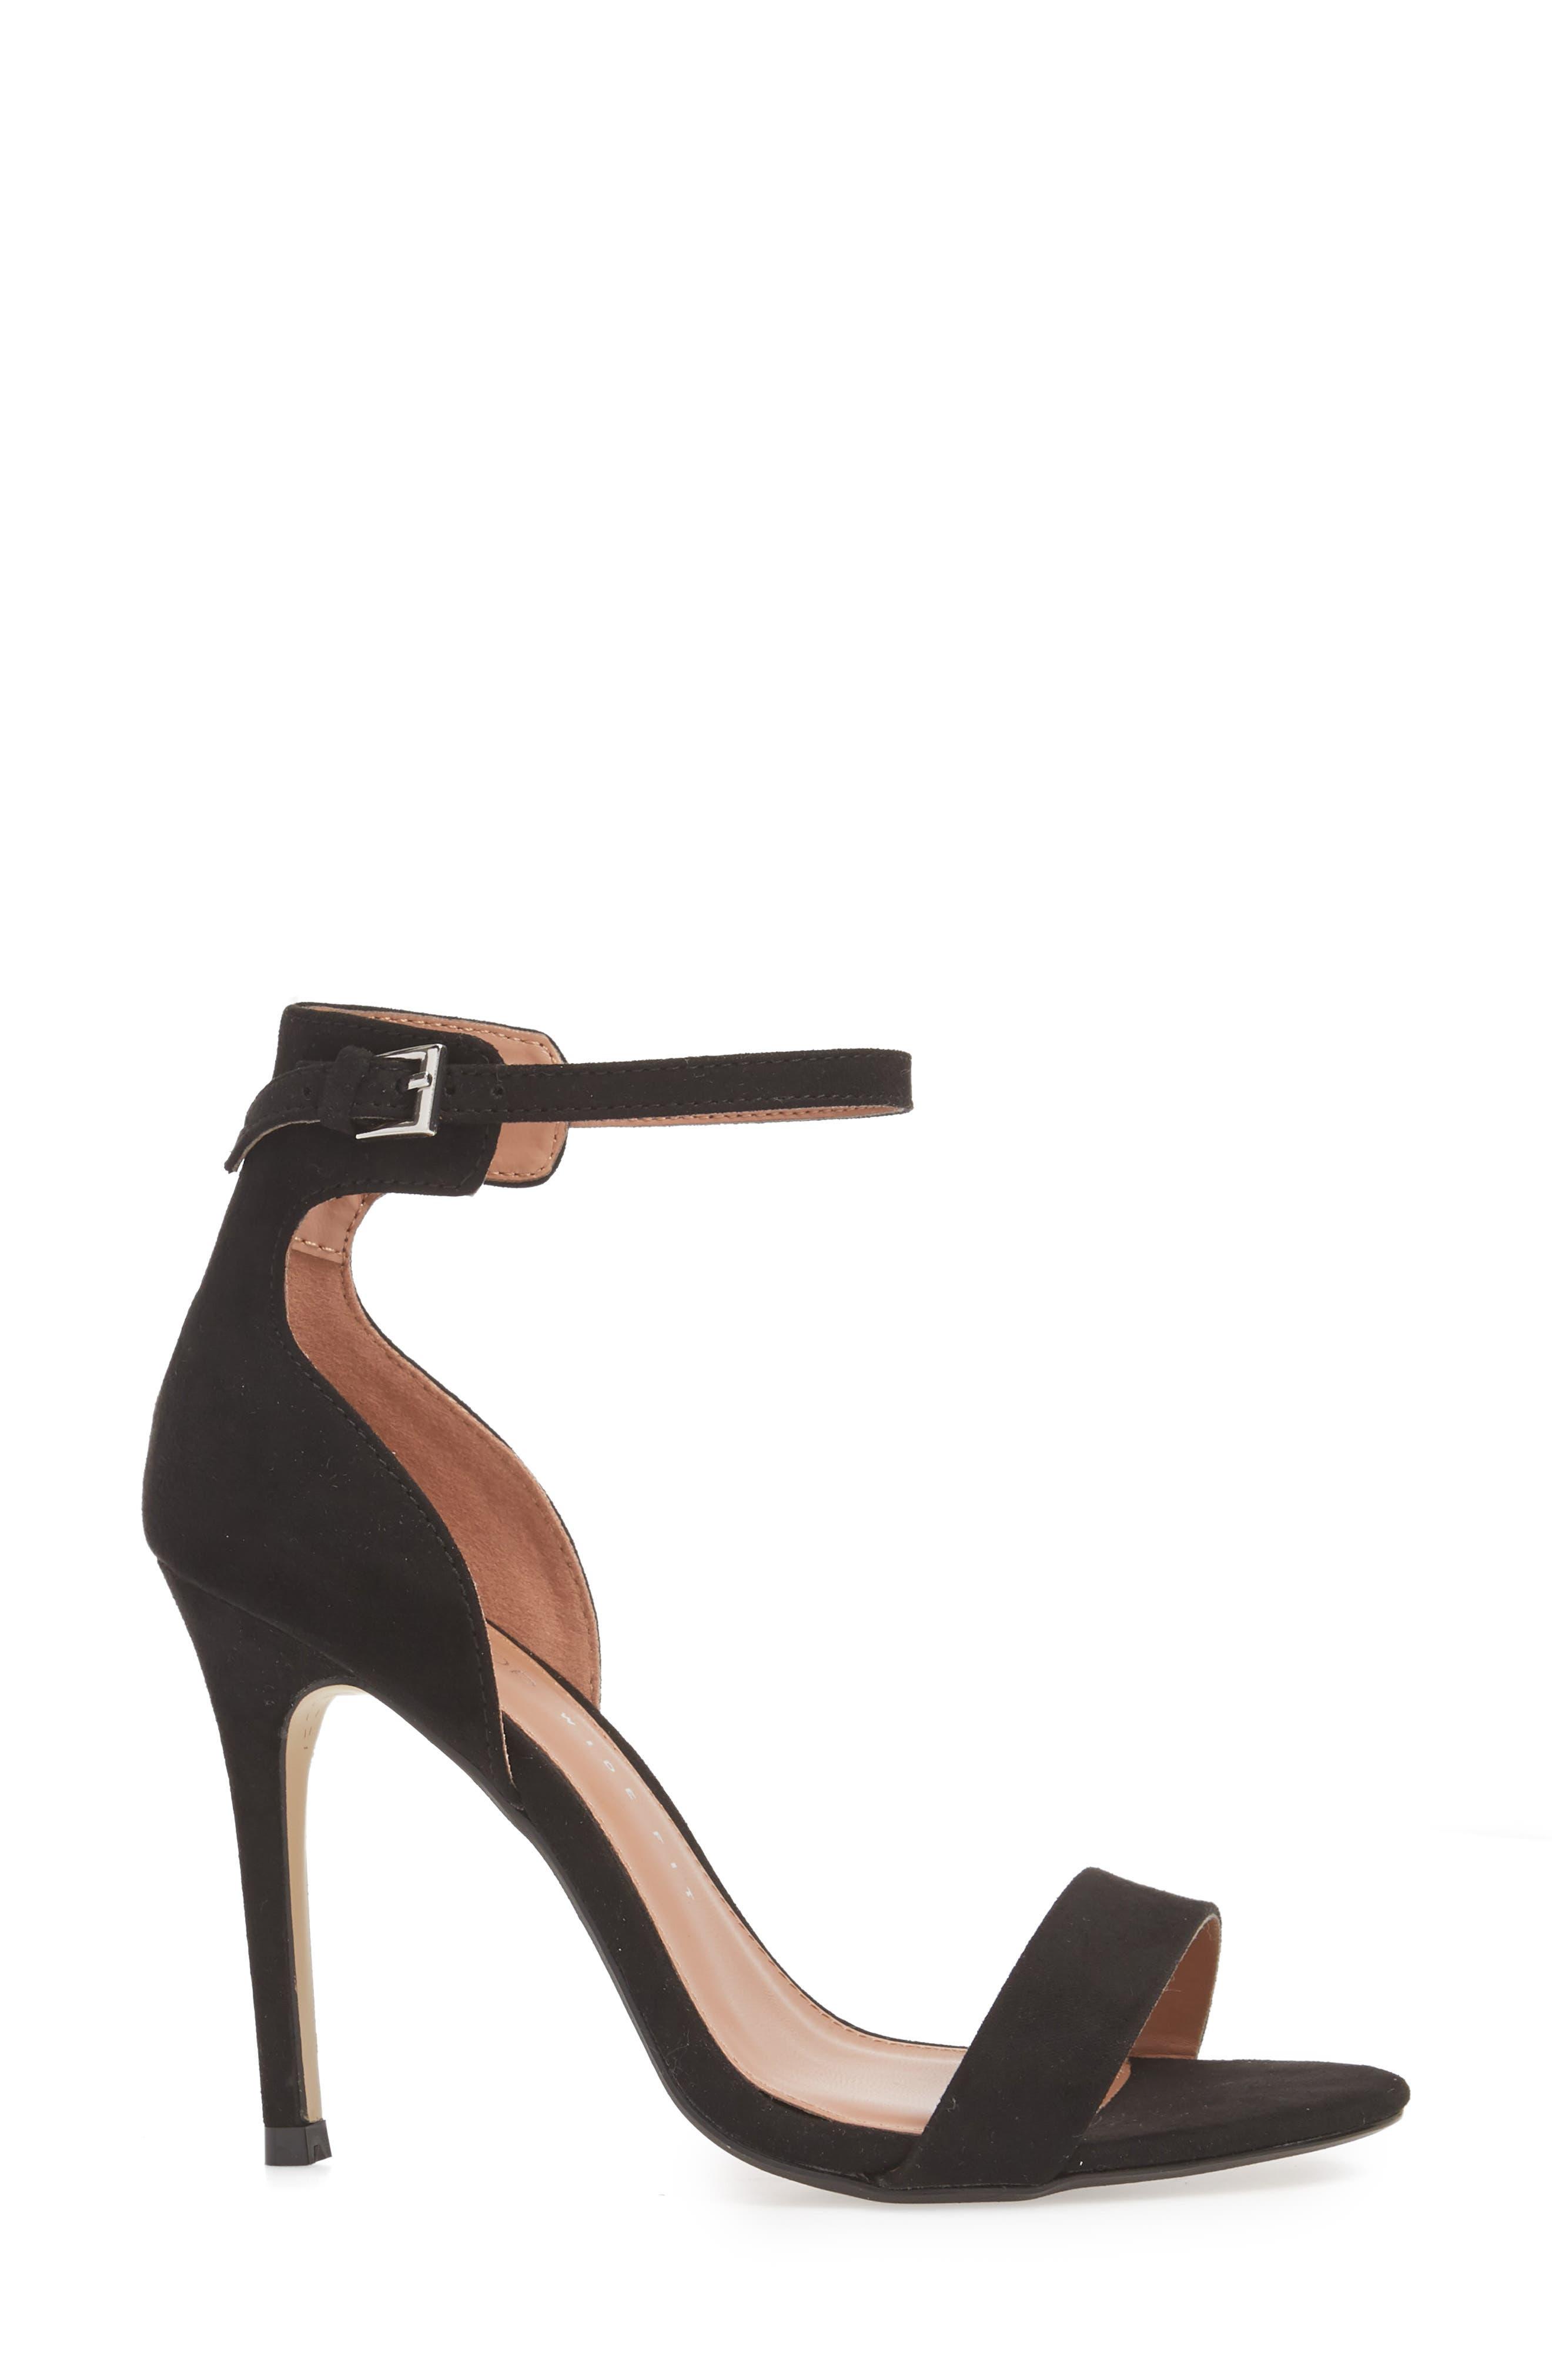 Marcelle Ankle Strap Sandal,                             Alternate thumbnail 3, color,                             BLACK